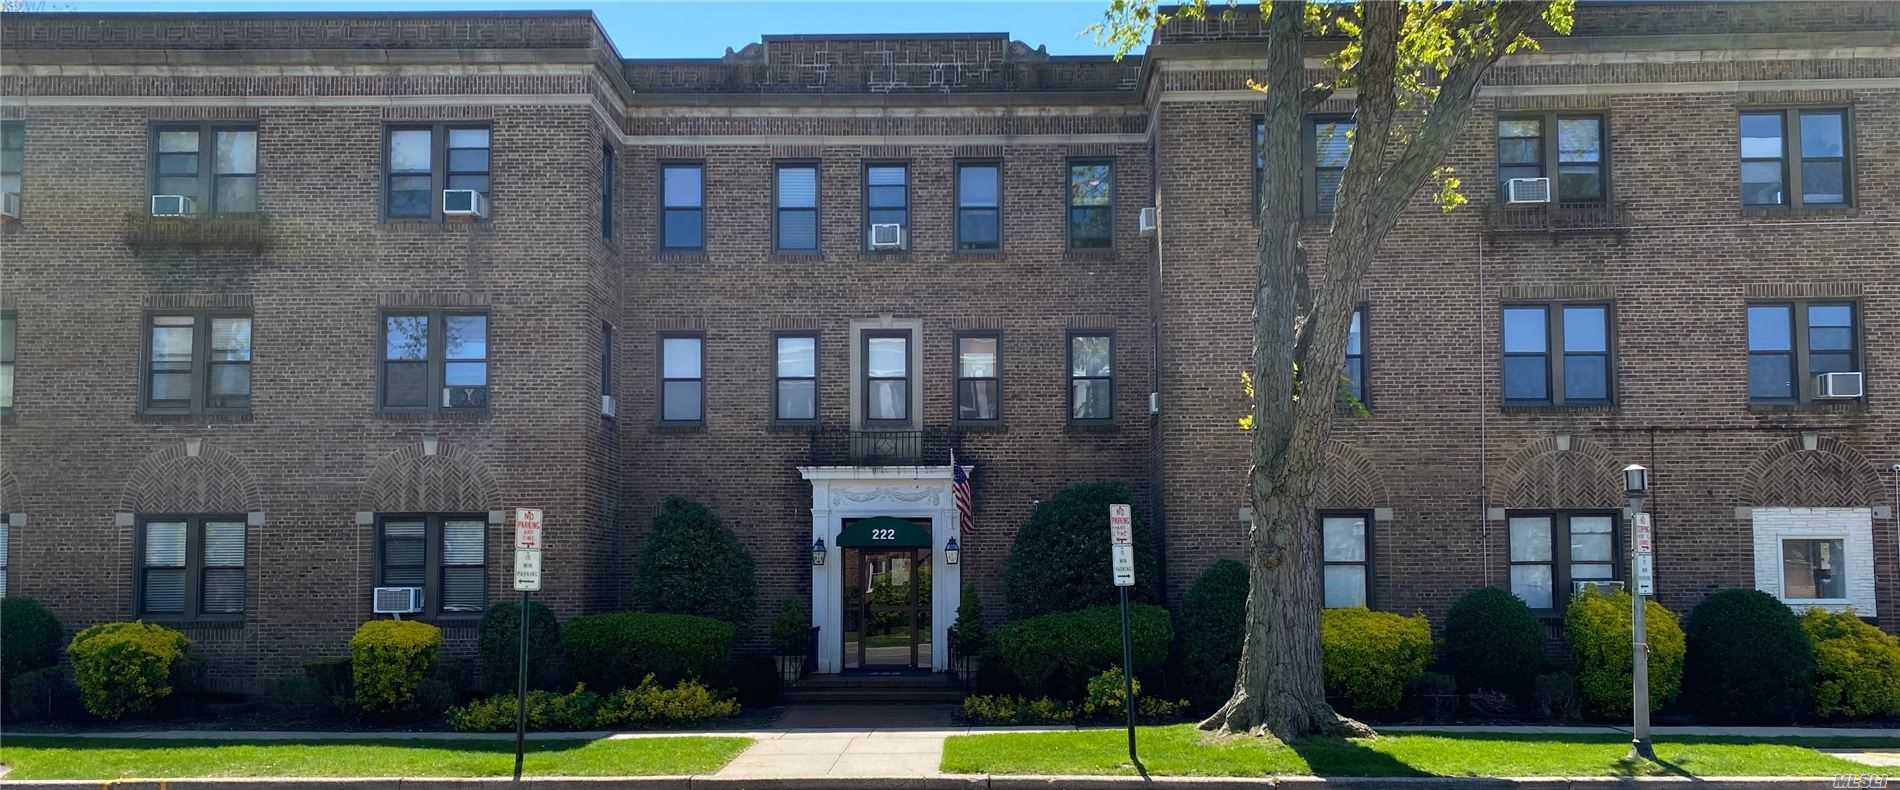 Property for sale at 222 7th Street # 2E, Garden City NY 11530, Garden City,  New York 11530